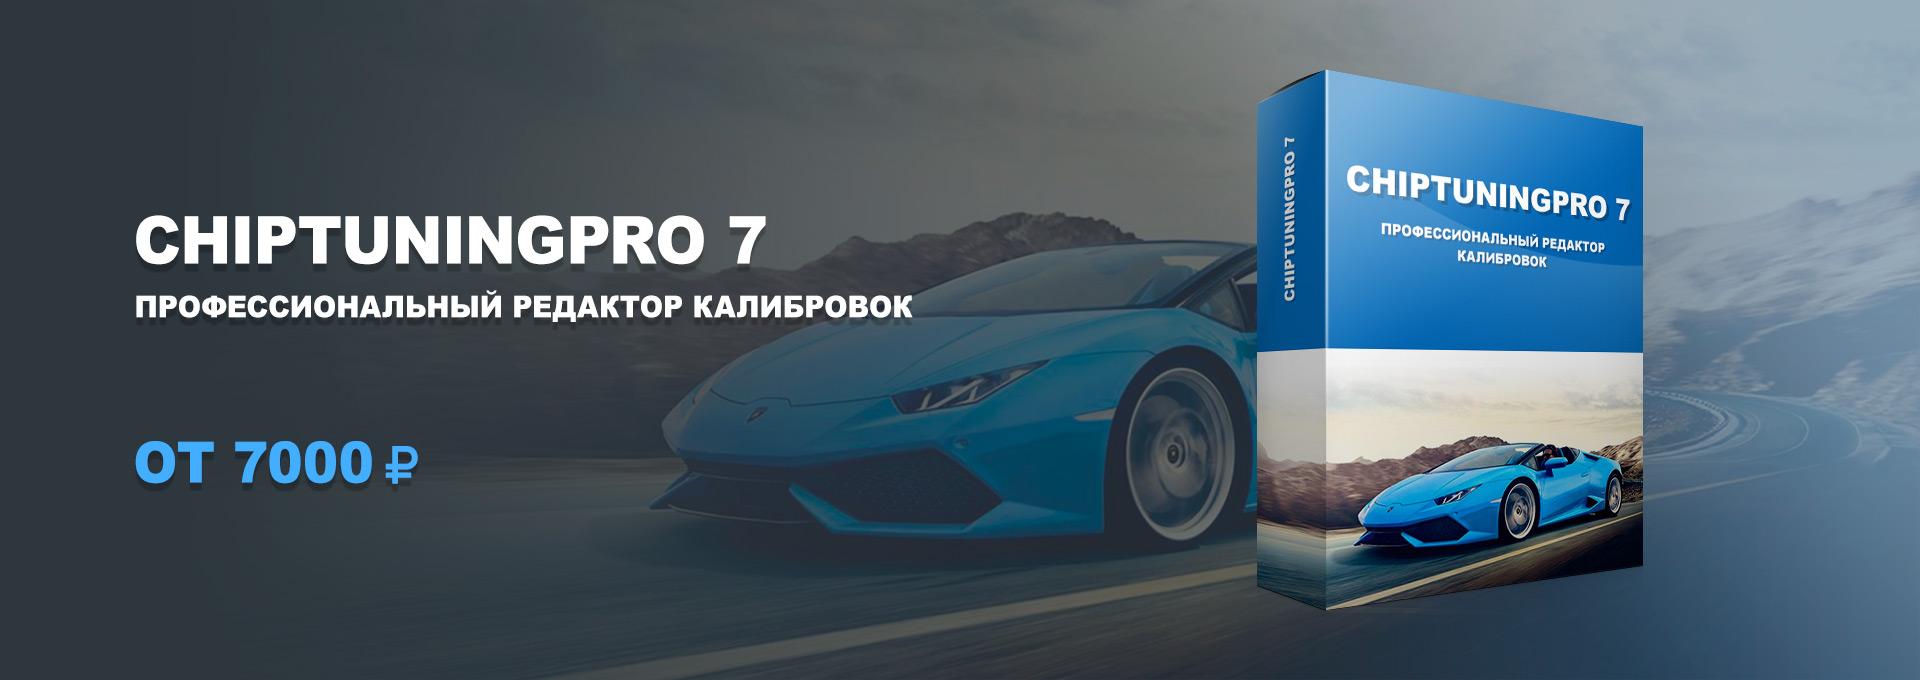 ChipTuningPro7